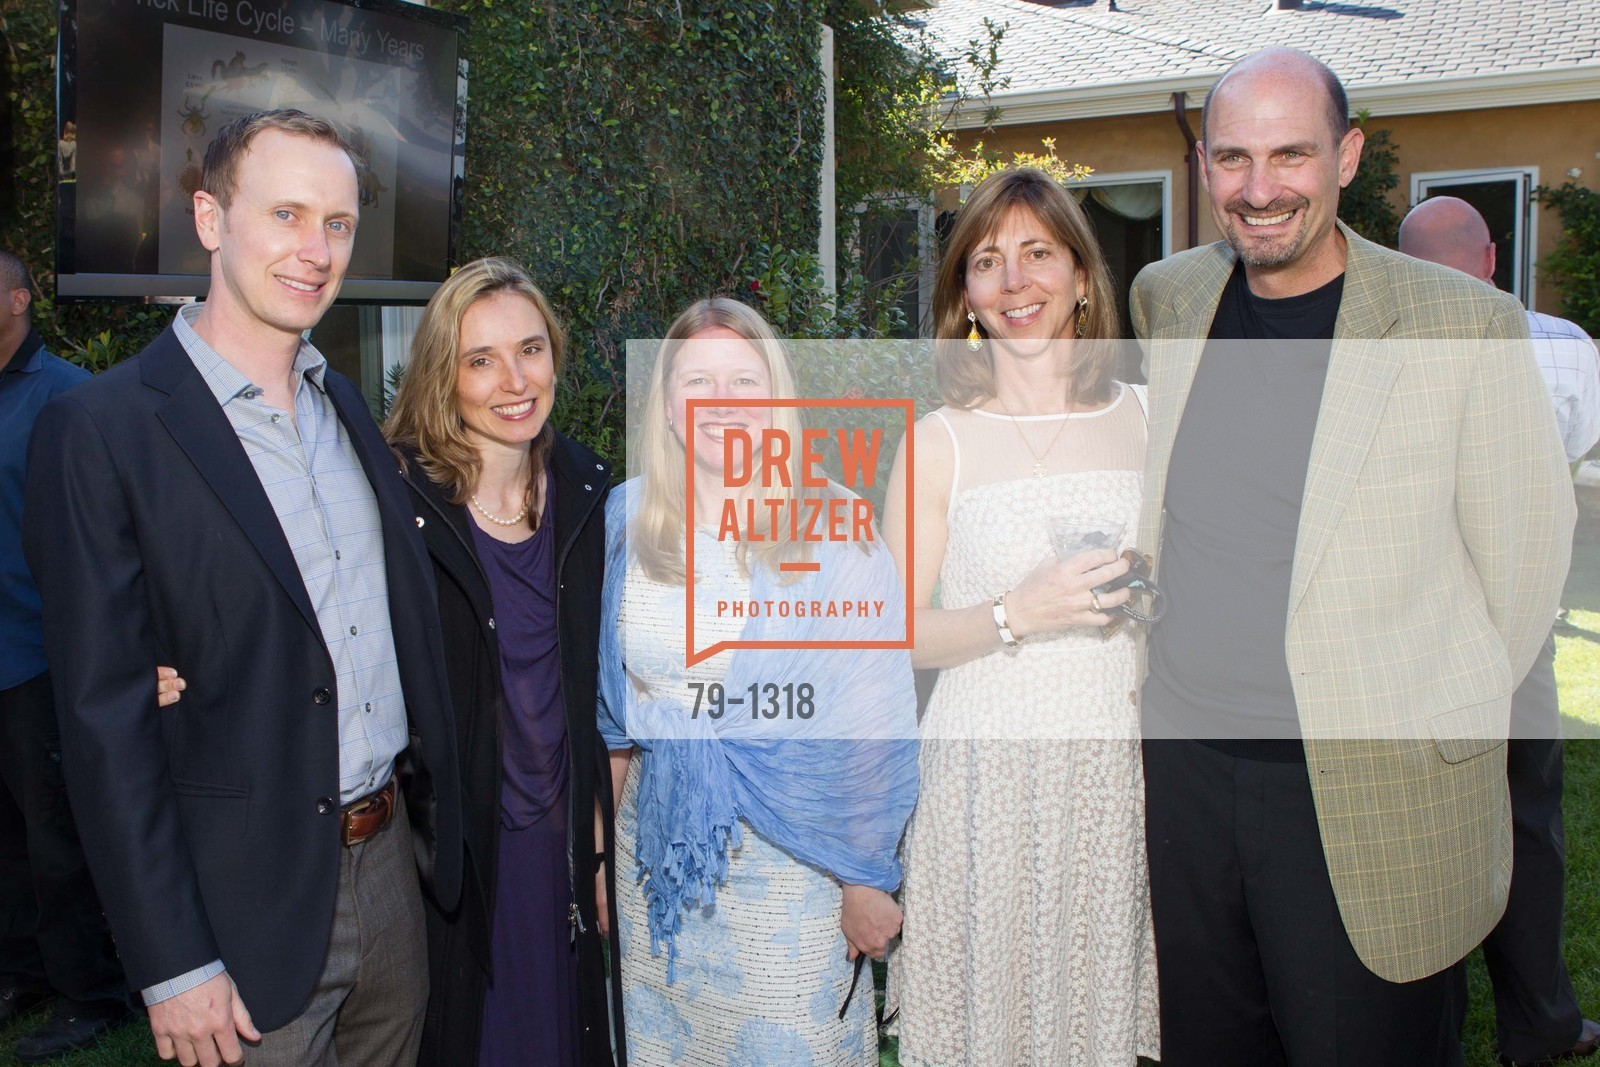 Liz Horn, ELizabeth Eshoo, Mark Eshoo, Photo #79-1318